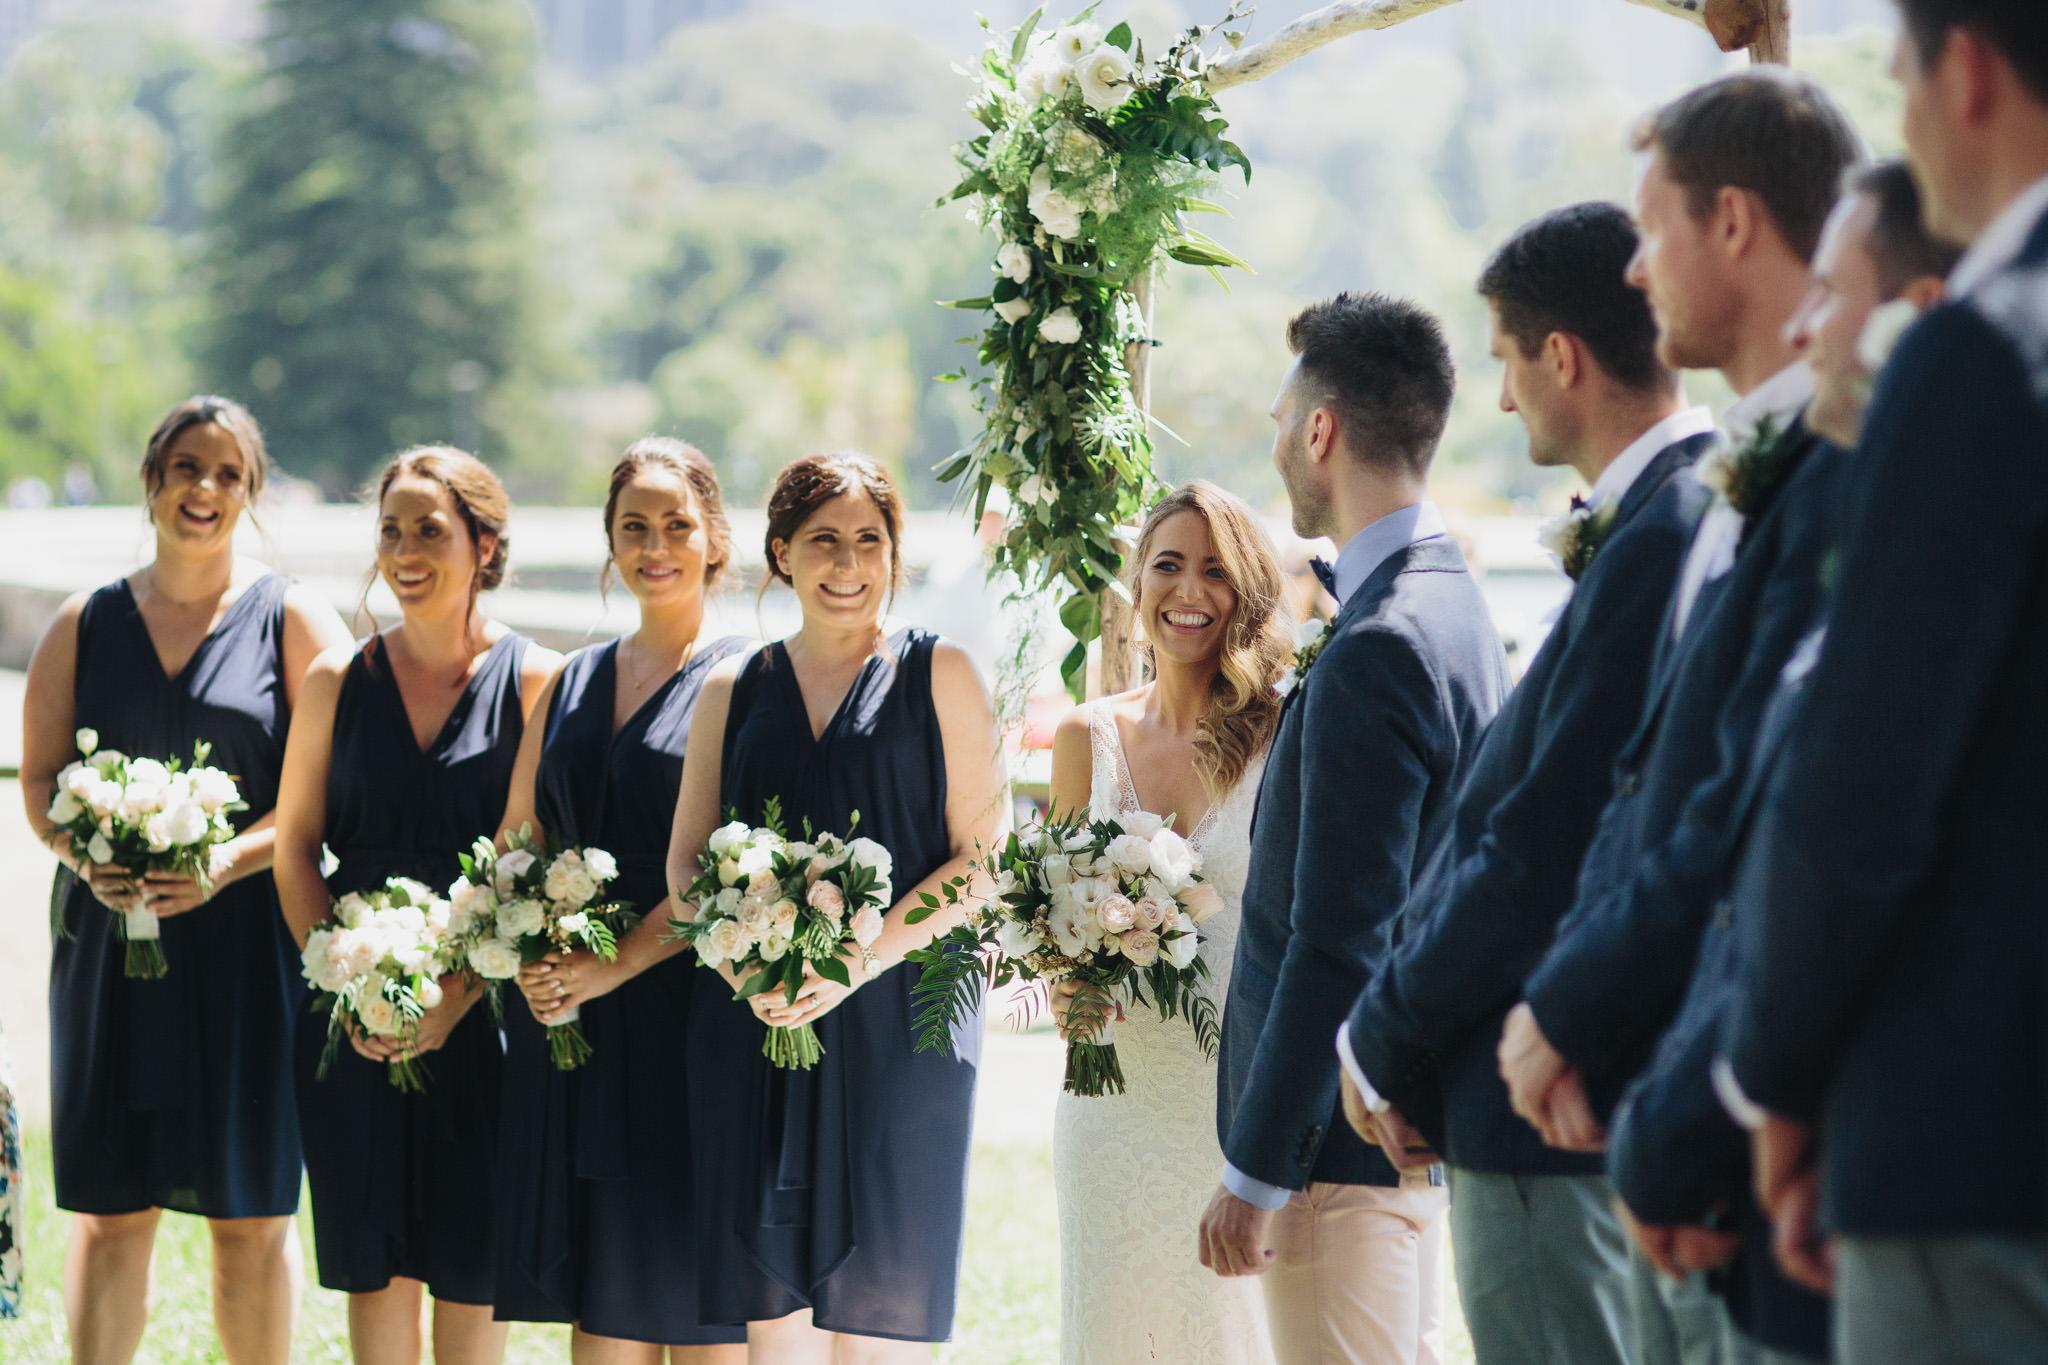 Wedding ceremony at Sydney Botanic Gardens Harbour View Lawn